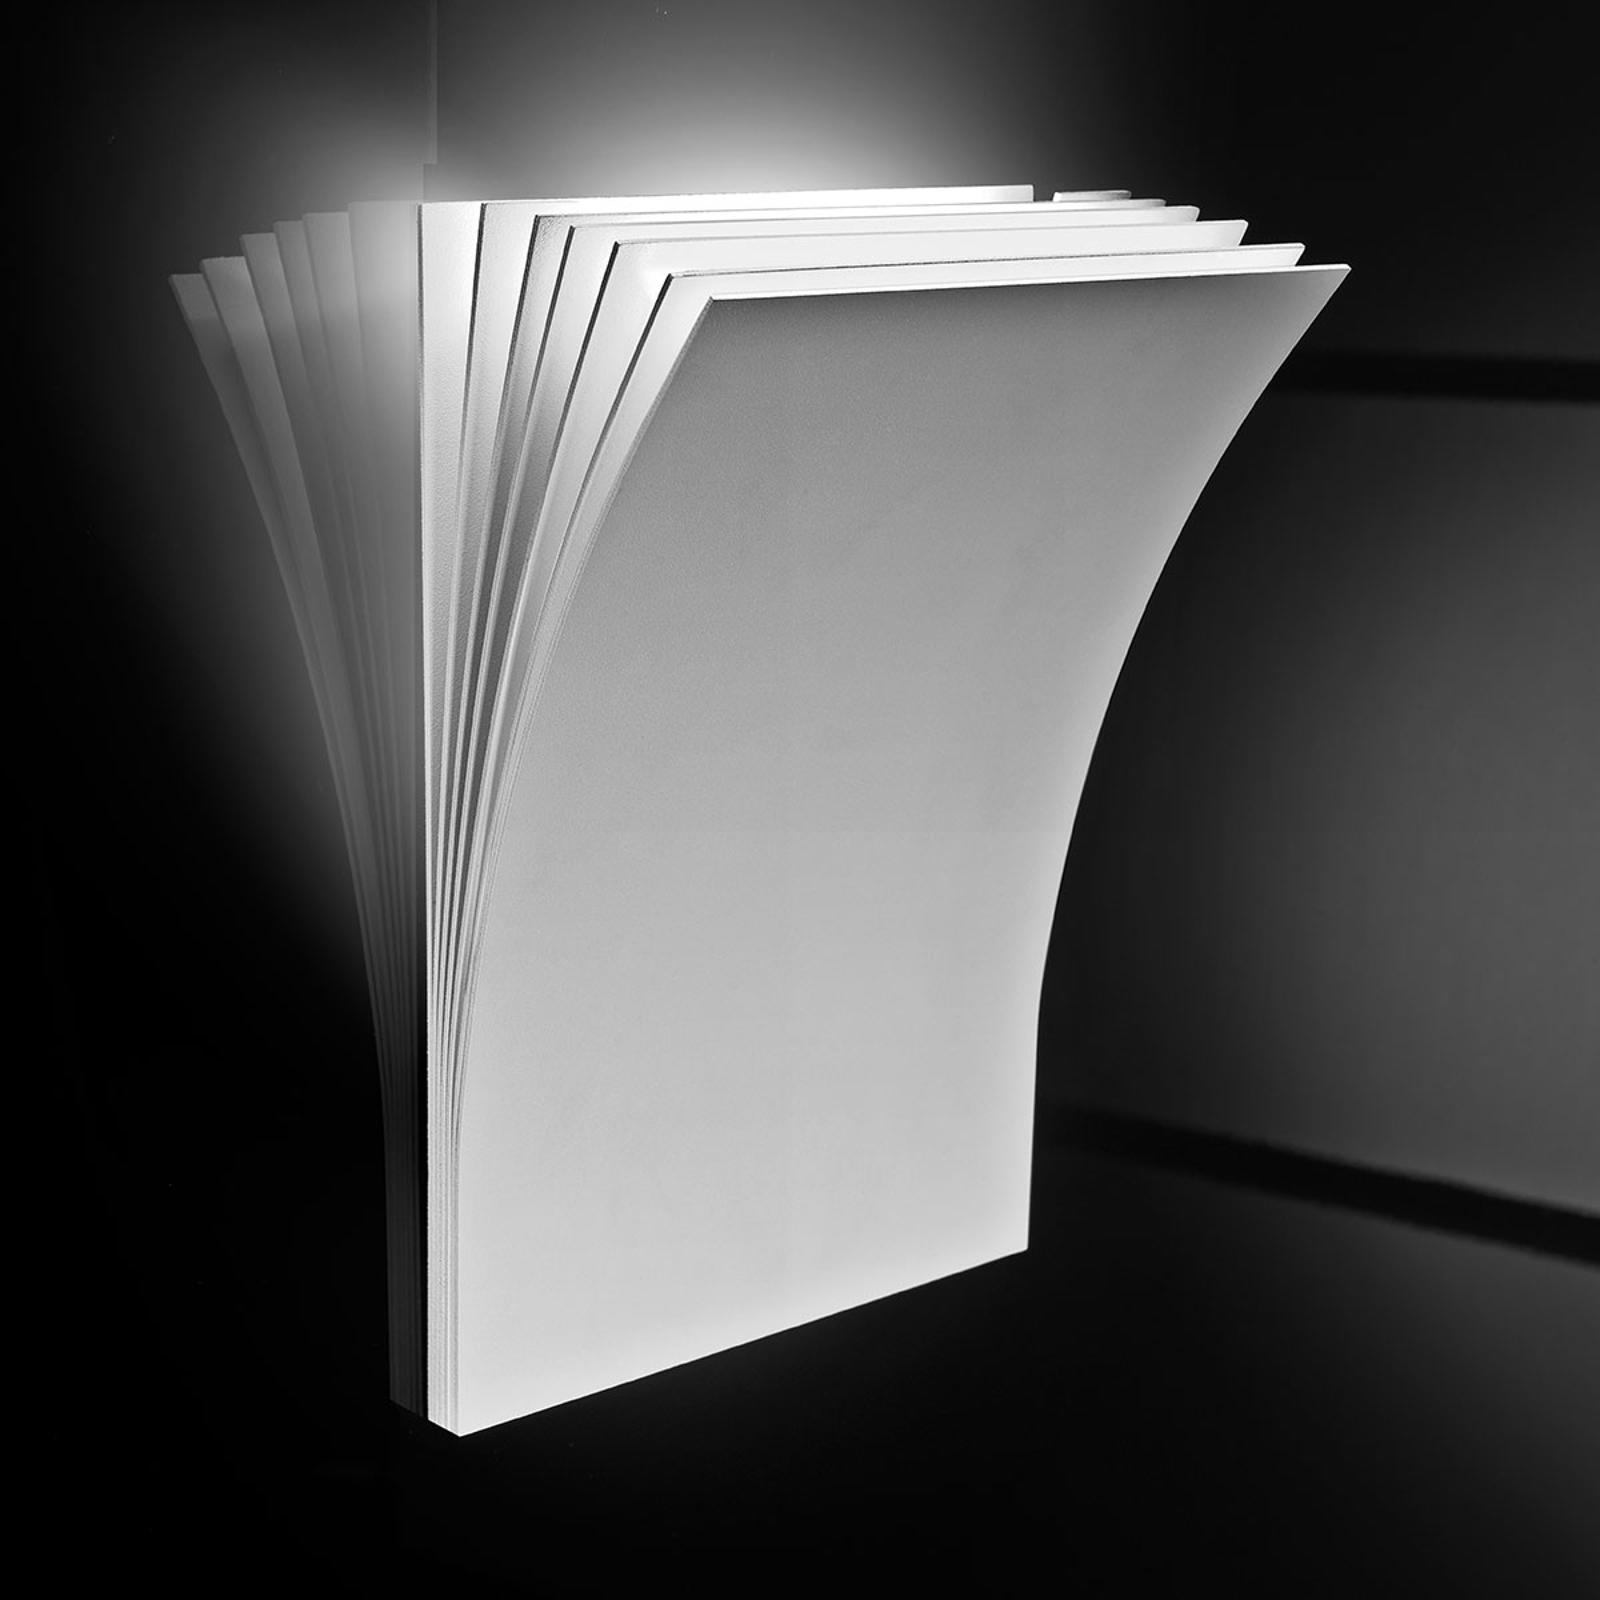 Axolight Polia nástenné LED svietidlo, biele 19cm_1088021_1